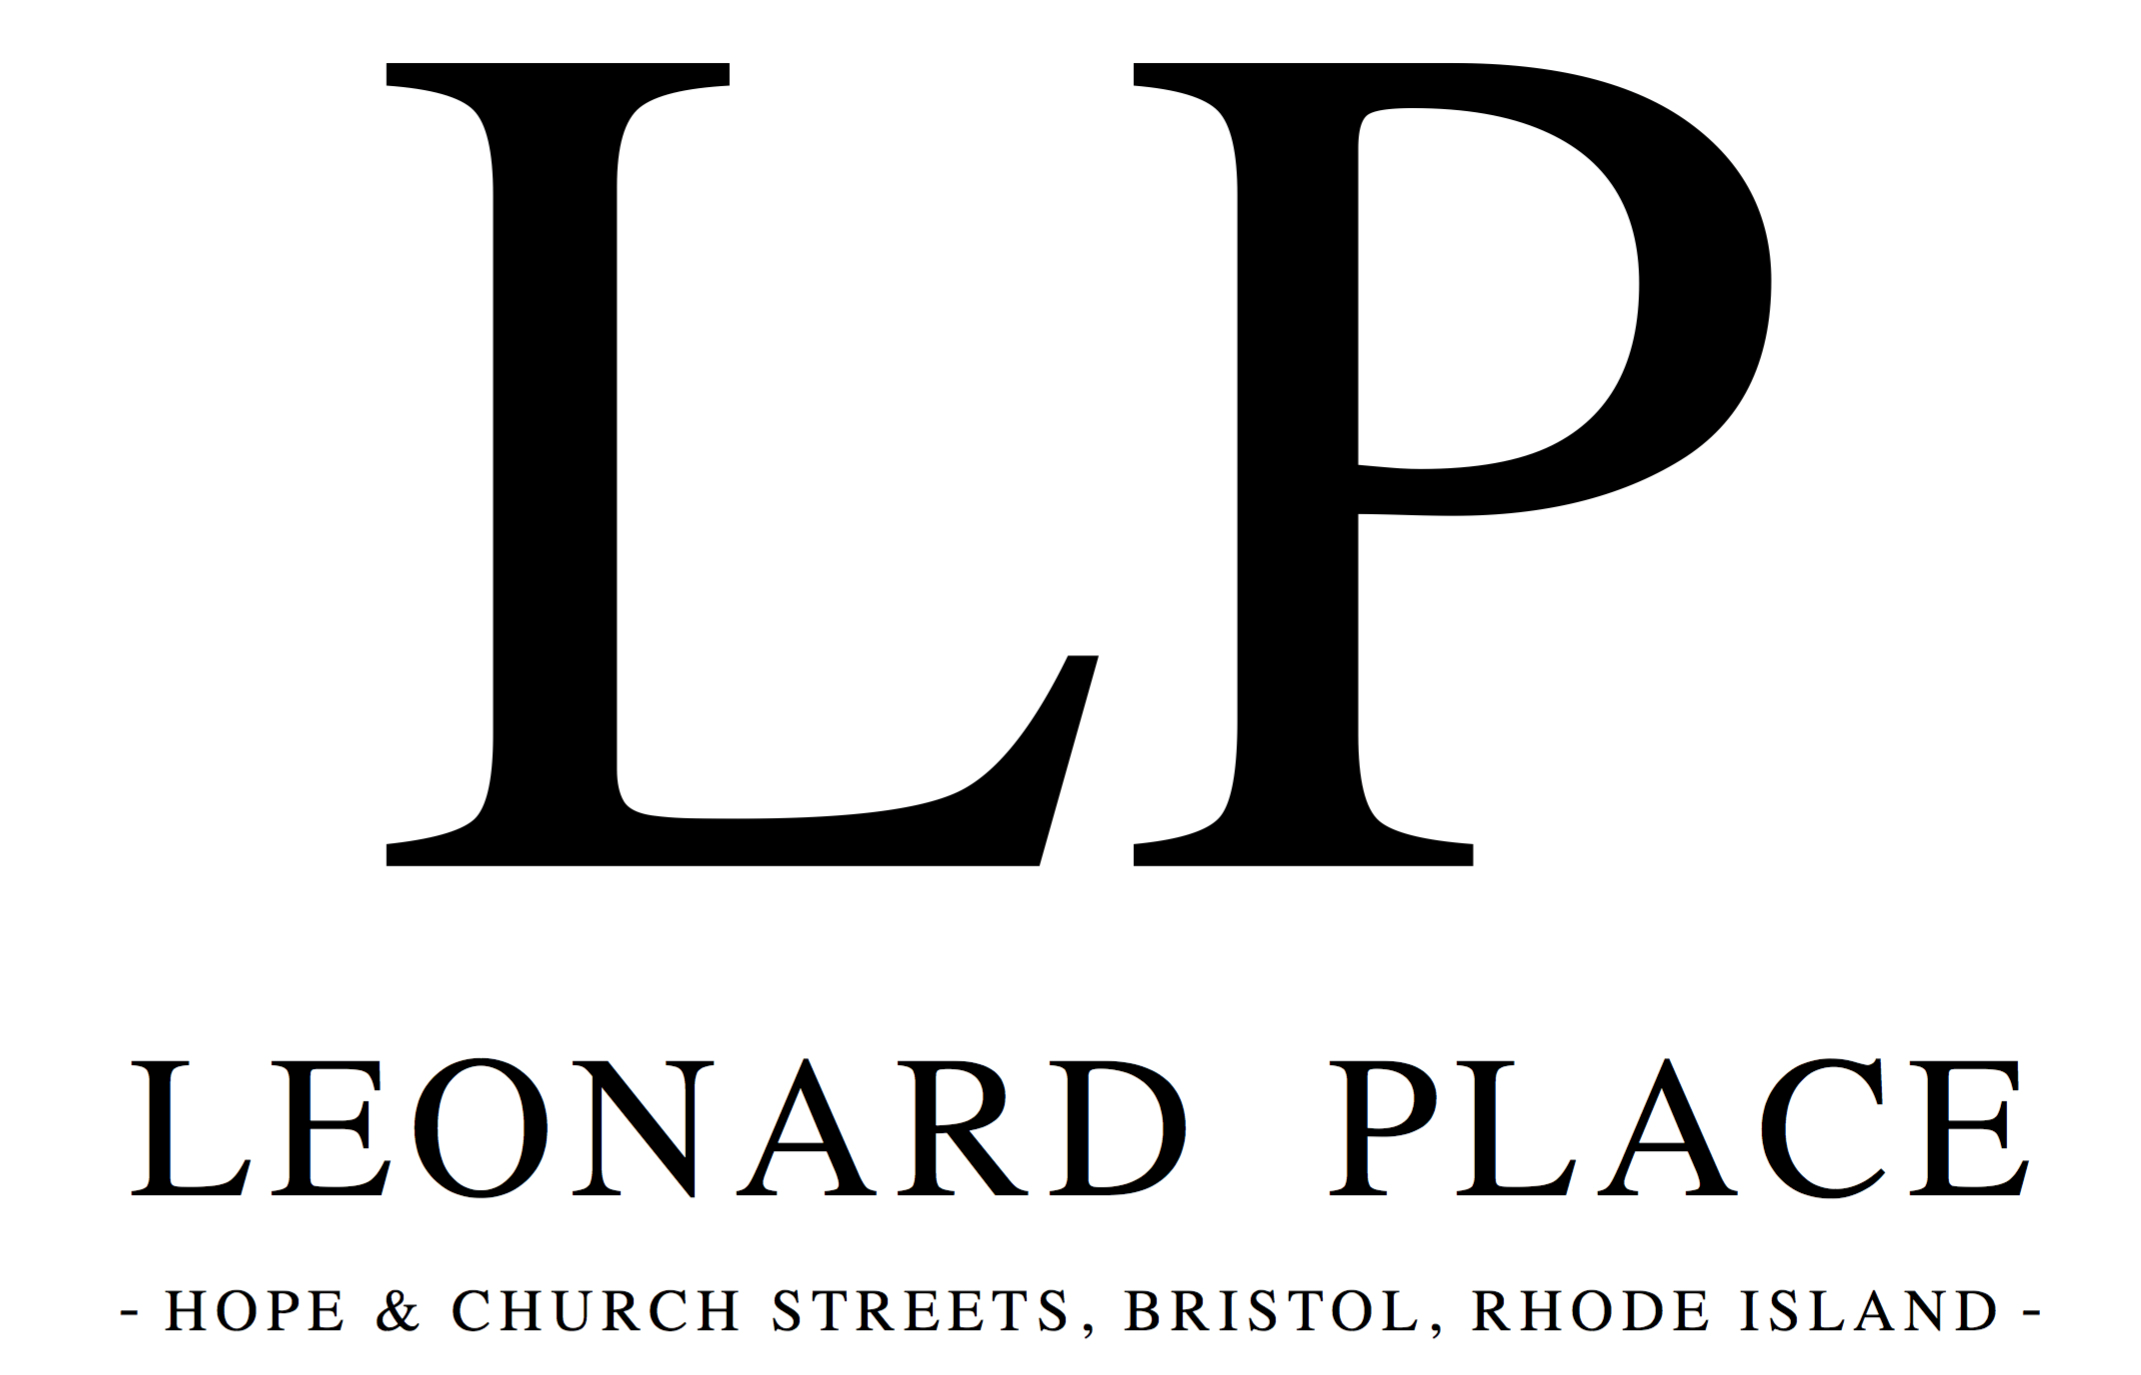 LEONARD PLACE